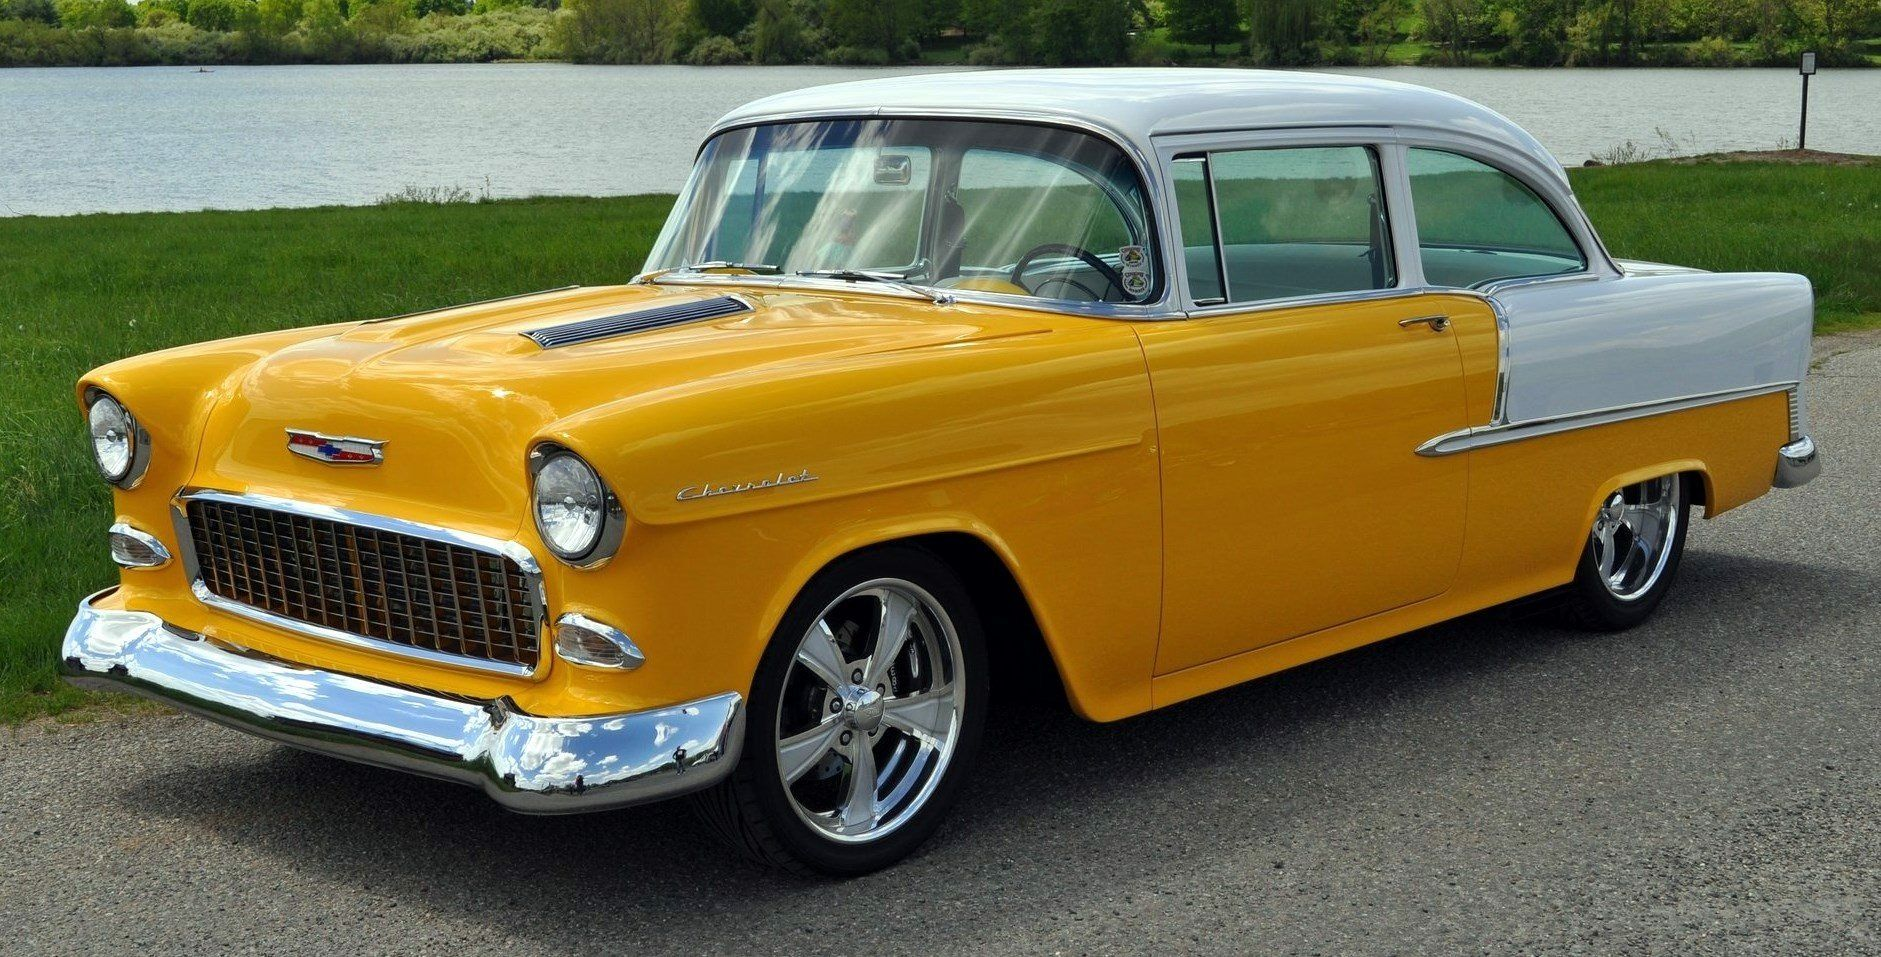 55 Chevy 1955 Chevy Chevy 55 Chevy